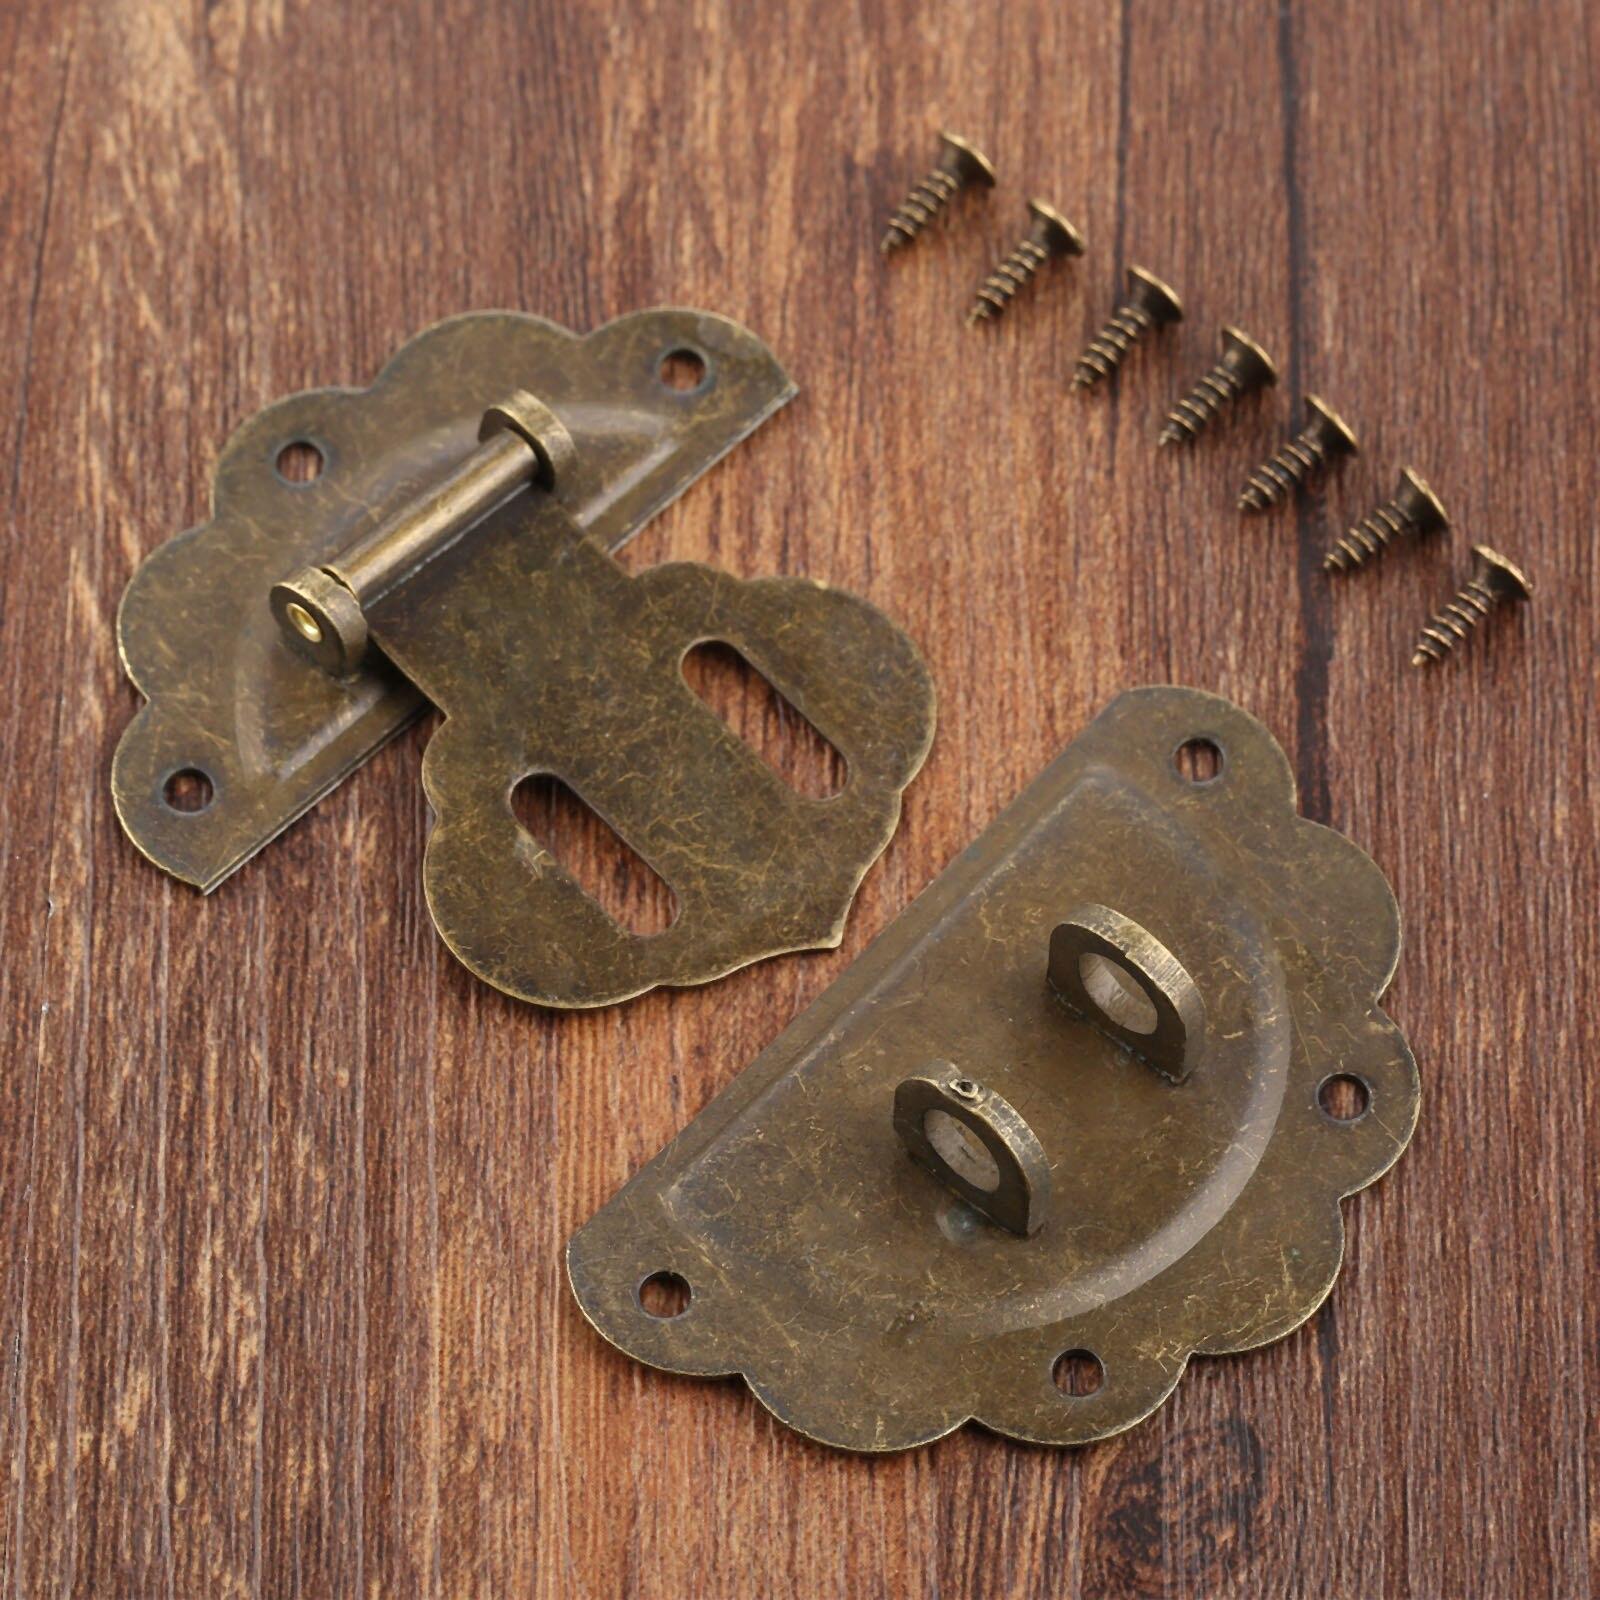 54*58mm Furniture Wooden Case Hasp Latch Vintage Jewelry Box Locking Buckle 1Pc